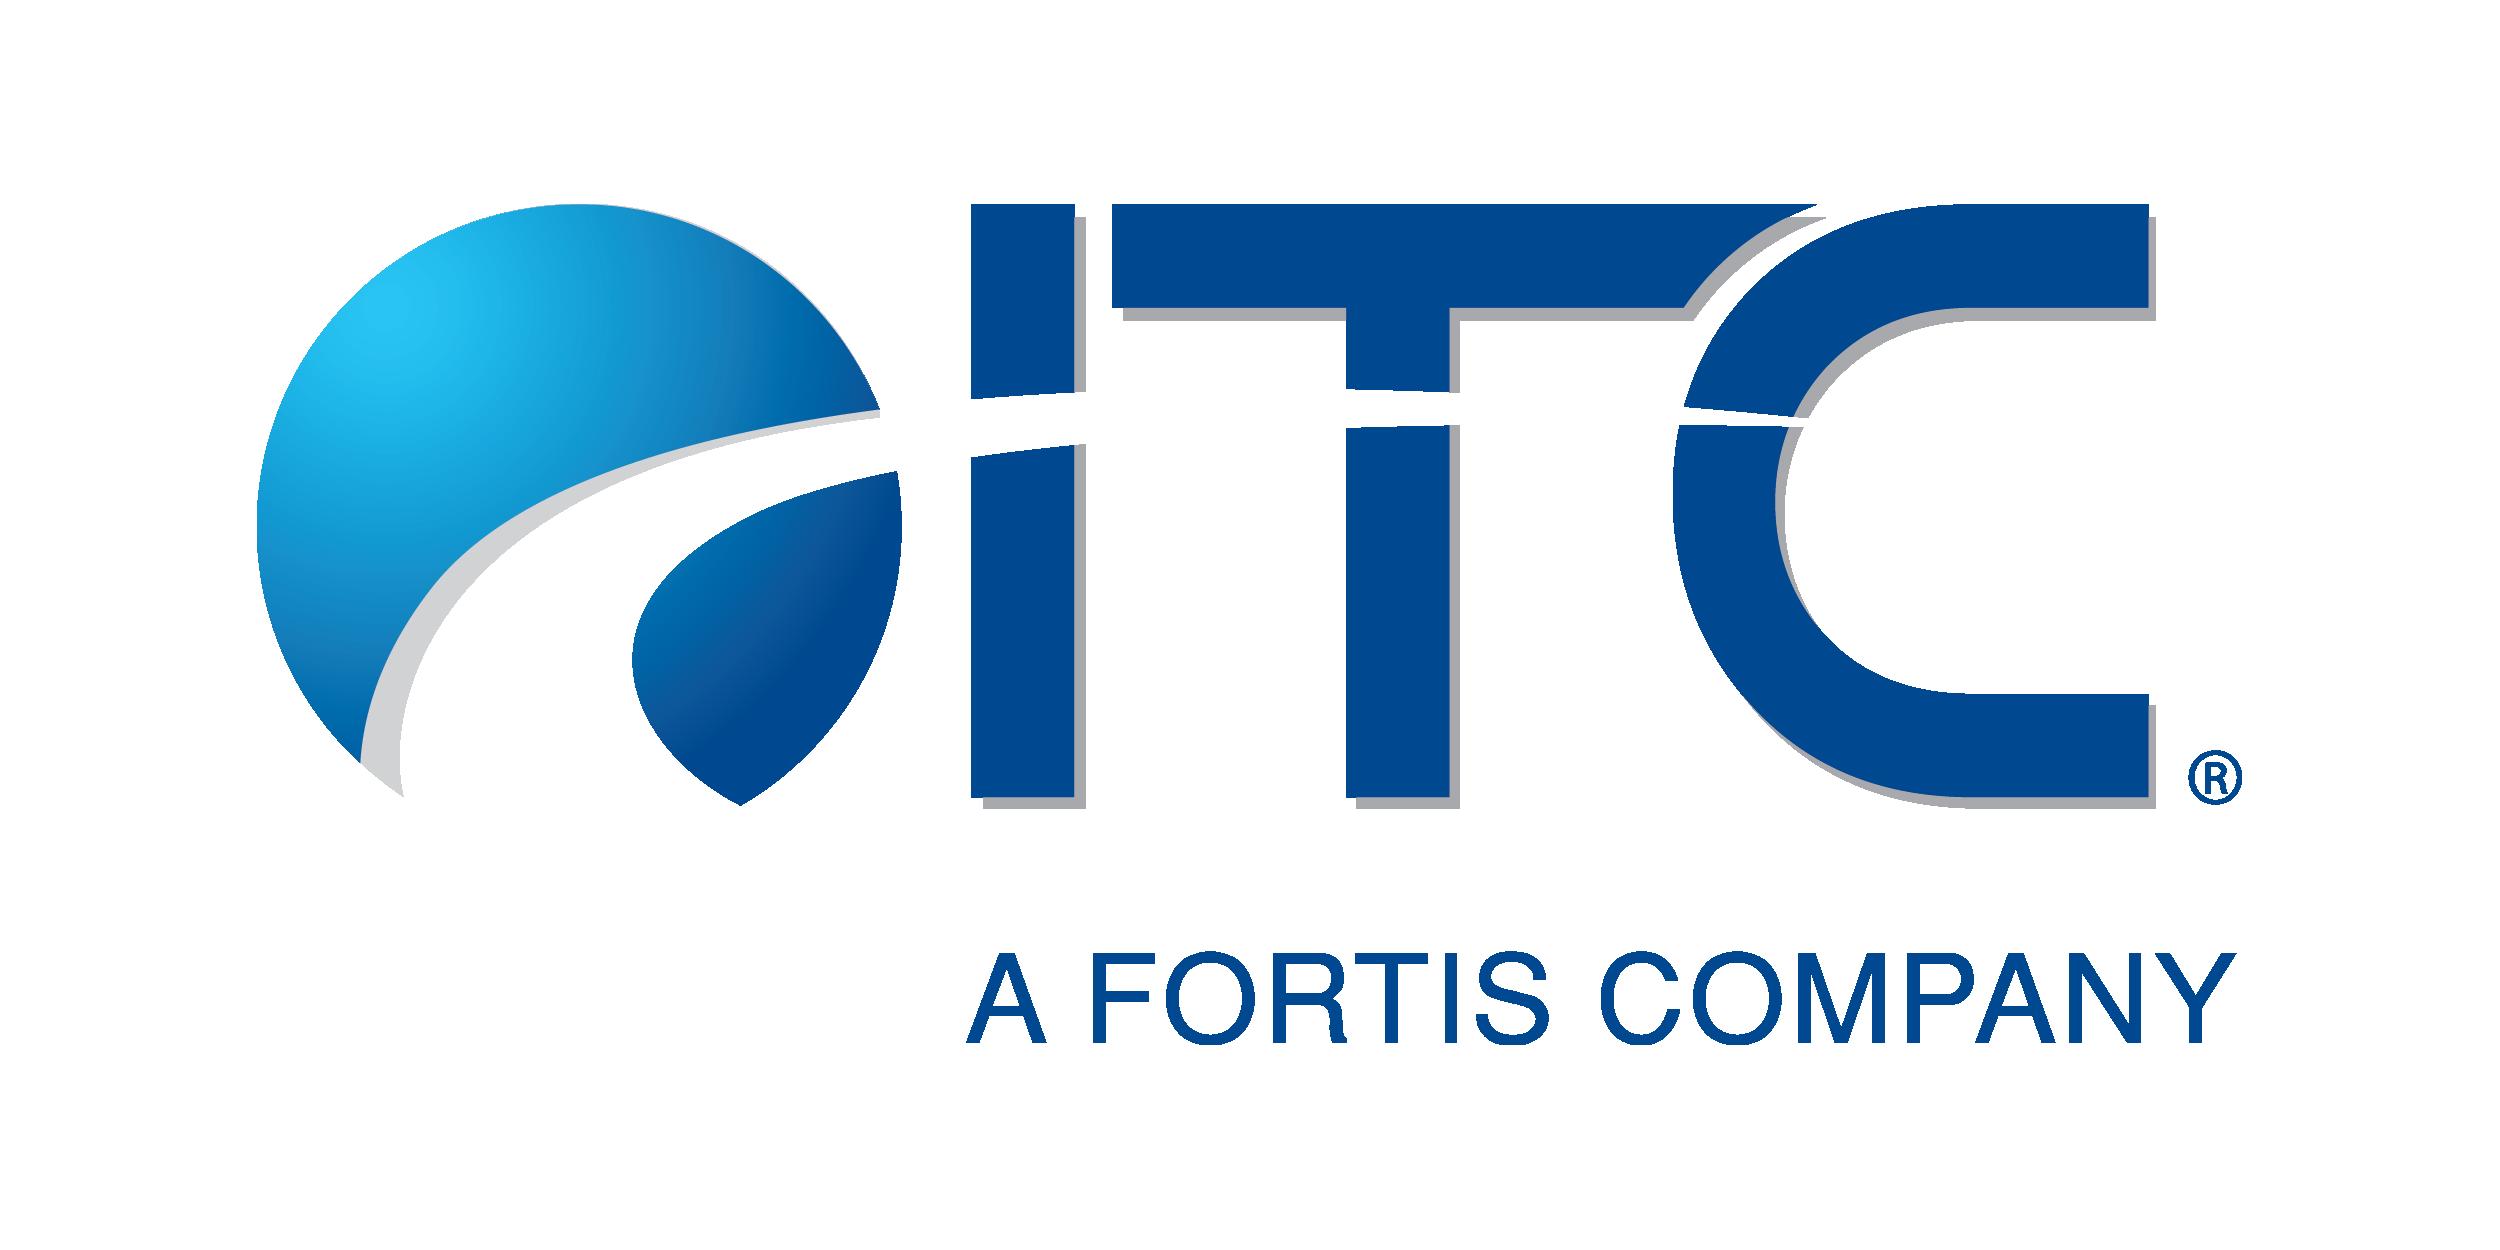 itc_fortis_logo_4c9ed0a27532376c5b9373ff64003dc3d8.png